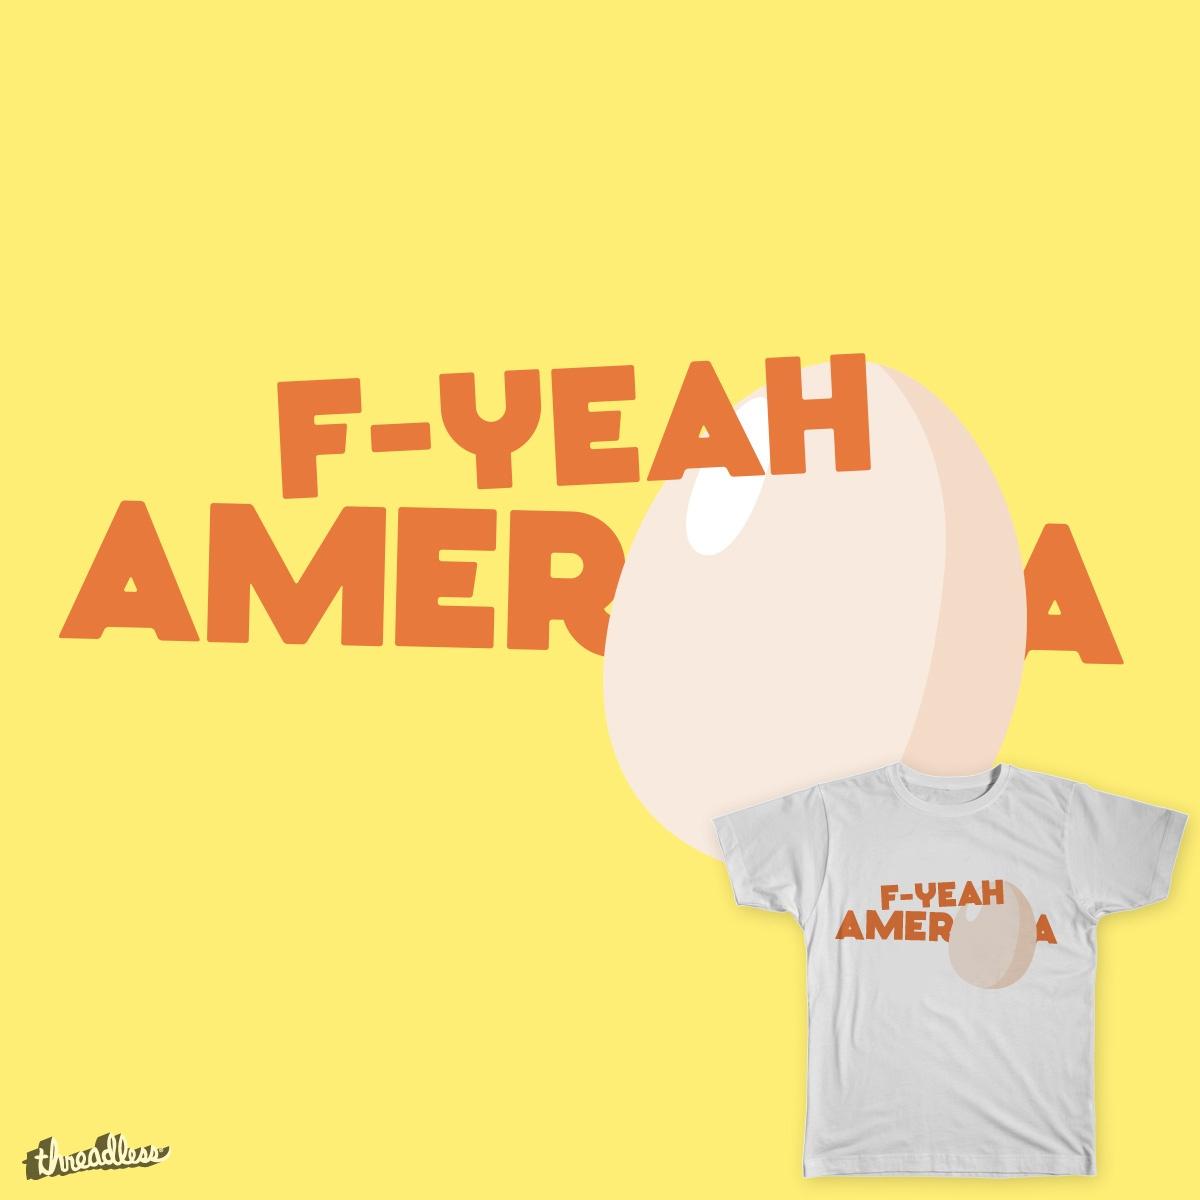 F-Yeah Ameregga! by stepjue on Threadless